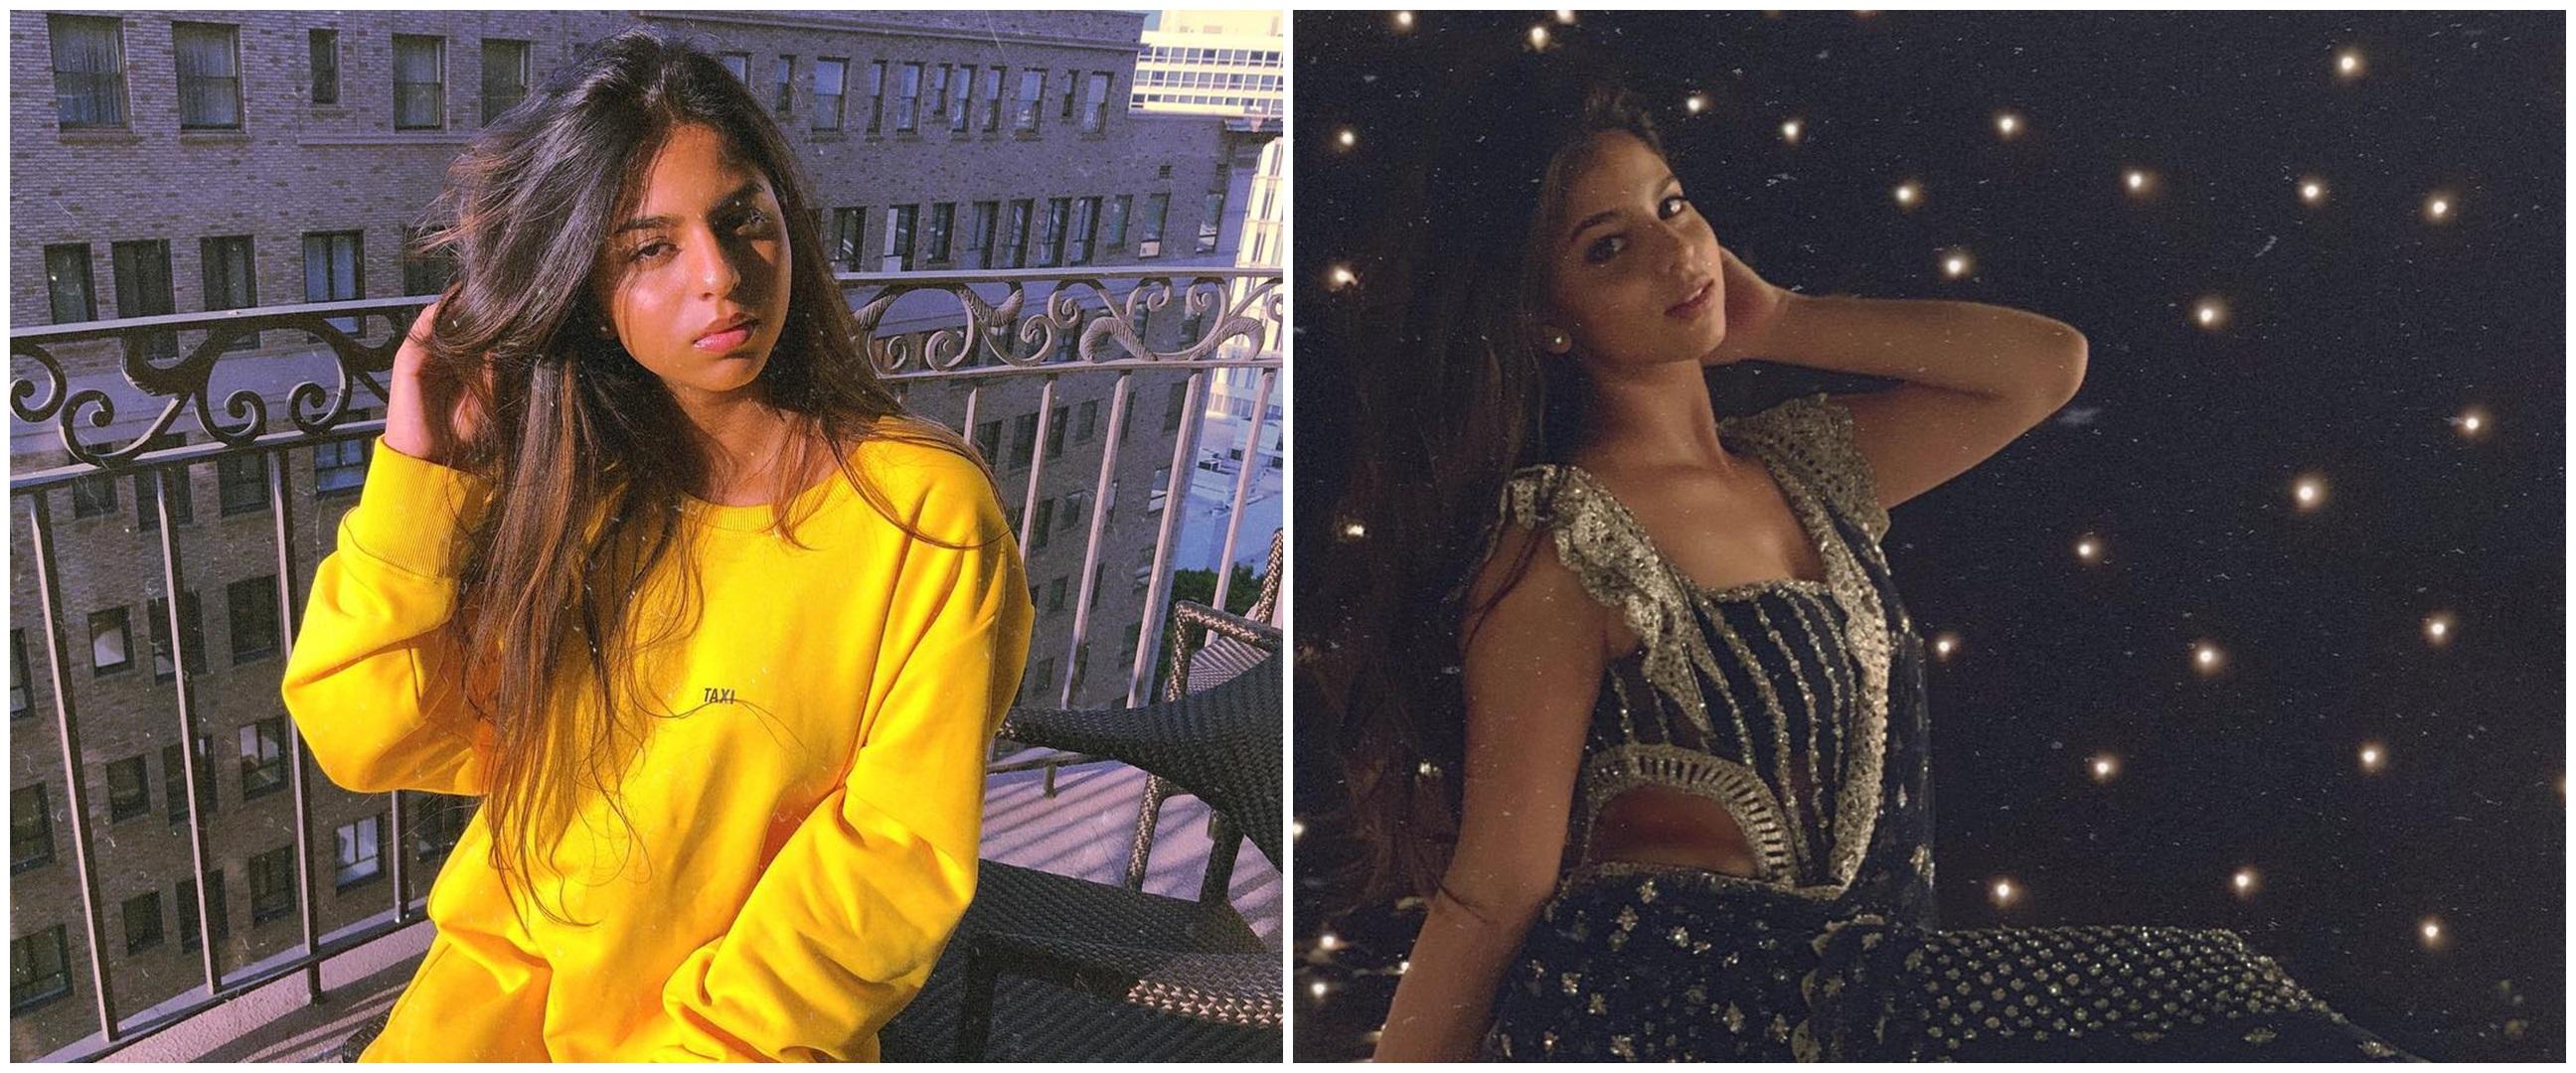 10 Pesona Suhana Khan, putri Shahrukh Khan yang kini beranjak dewasa